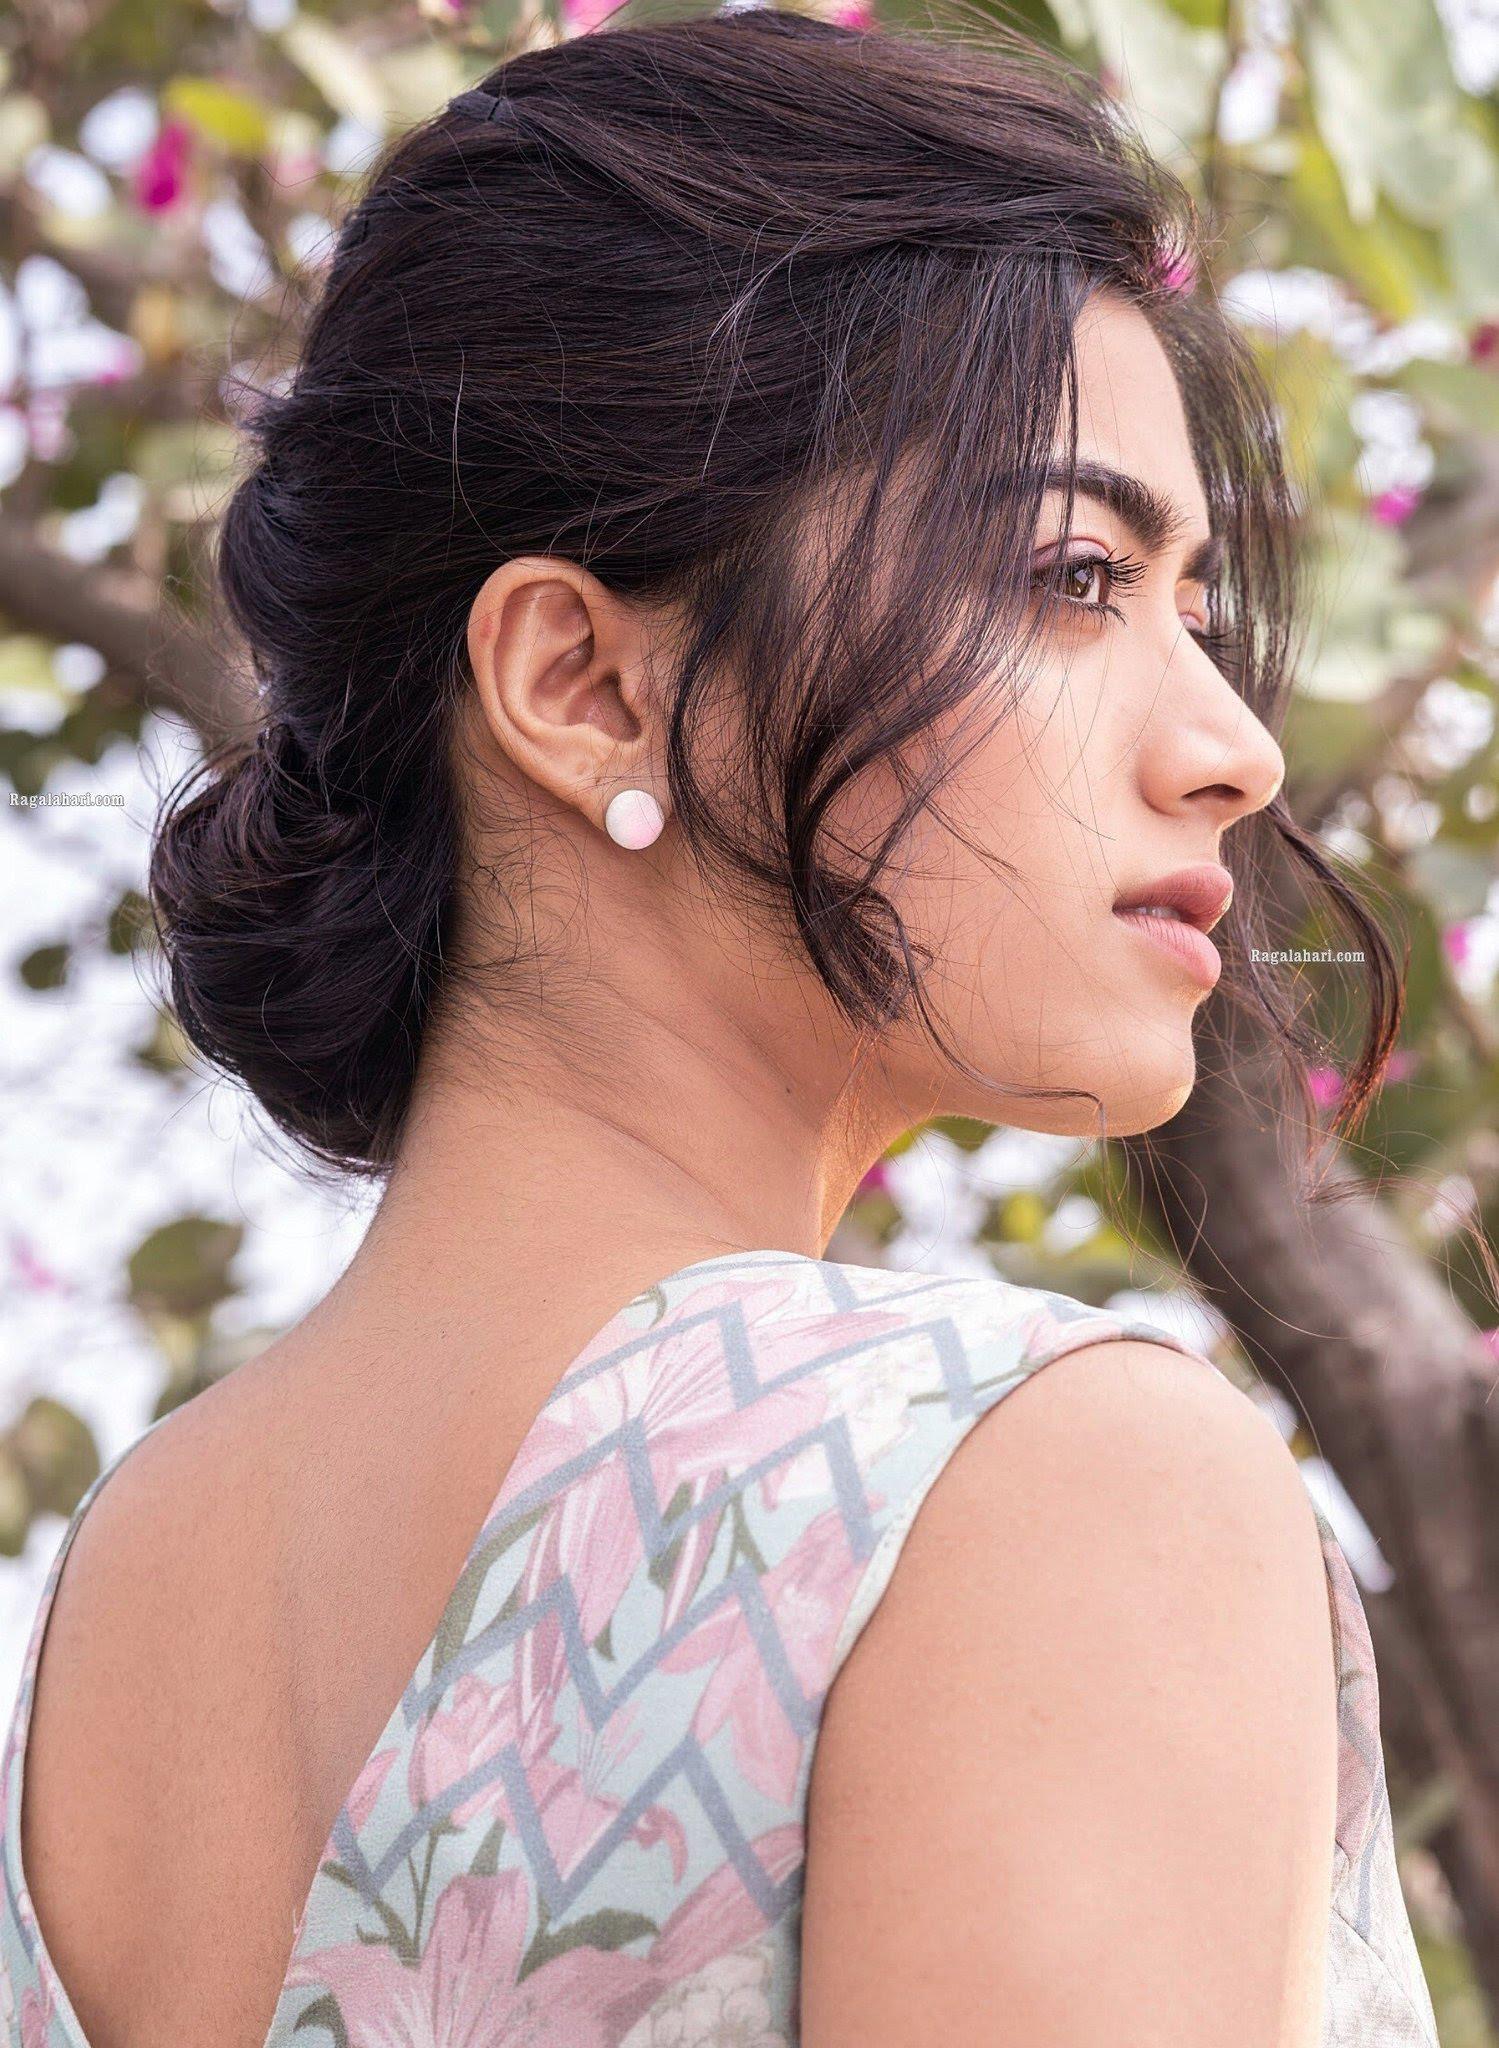 Rashmika-mandanna-images-931458